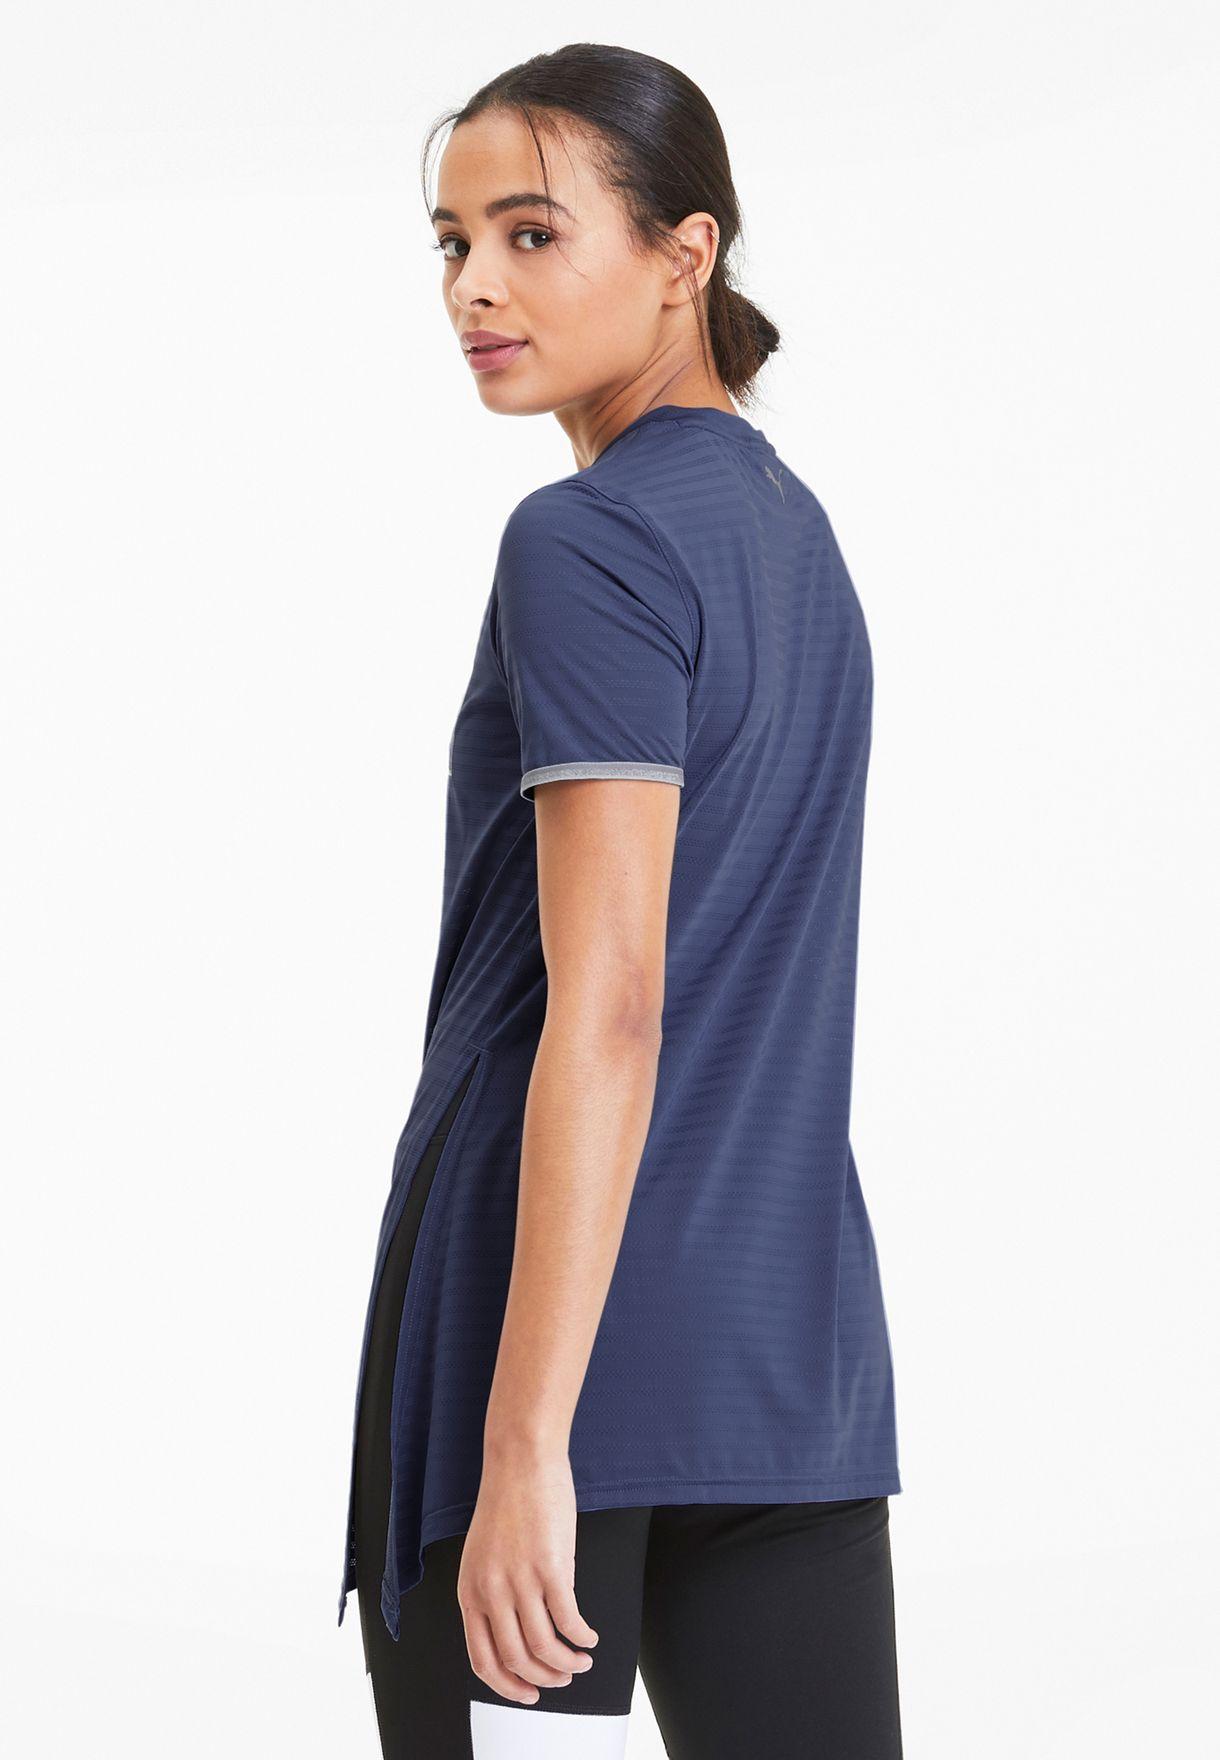 Neo-Future Mesh T-Shirt